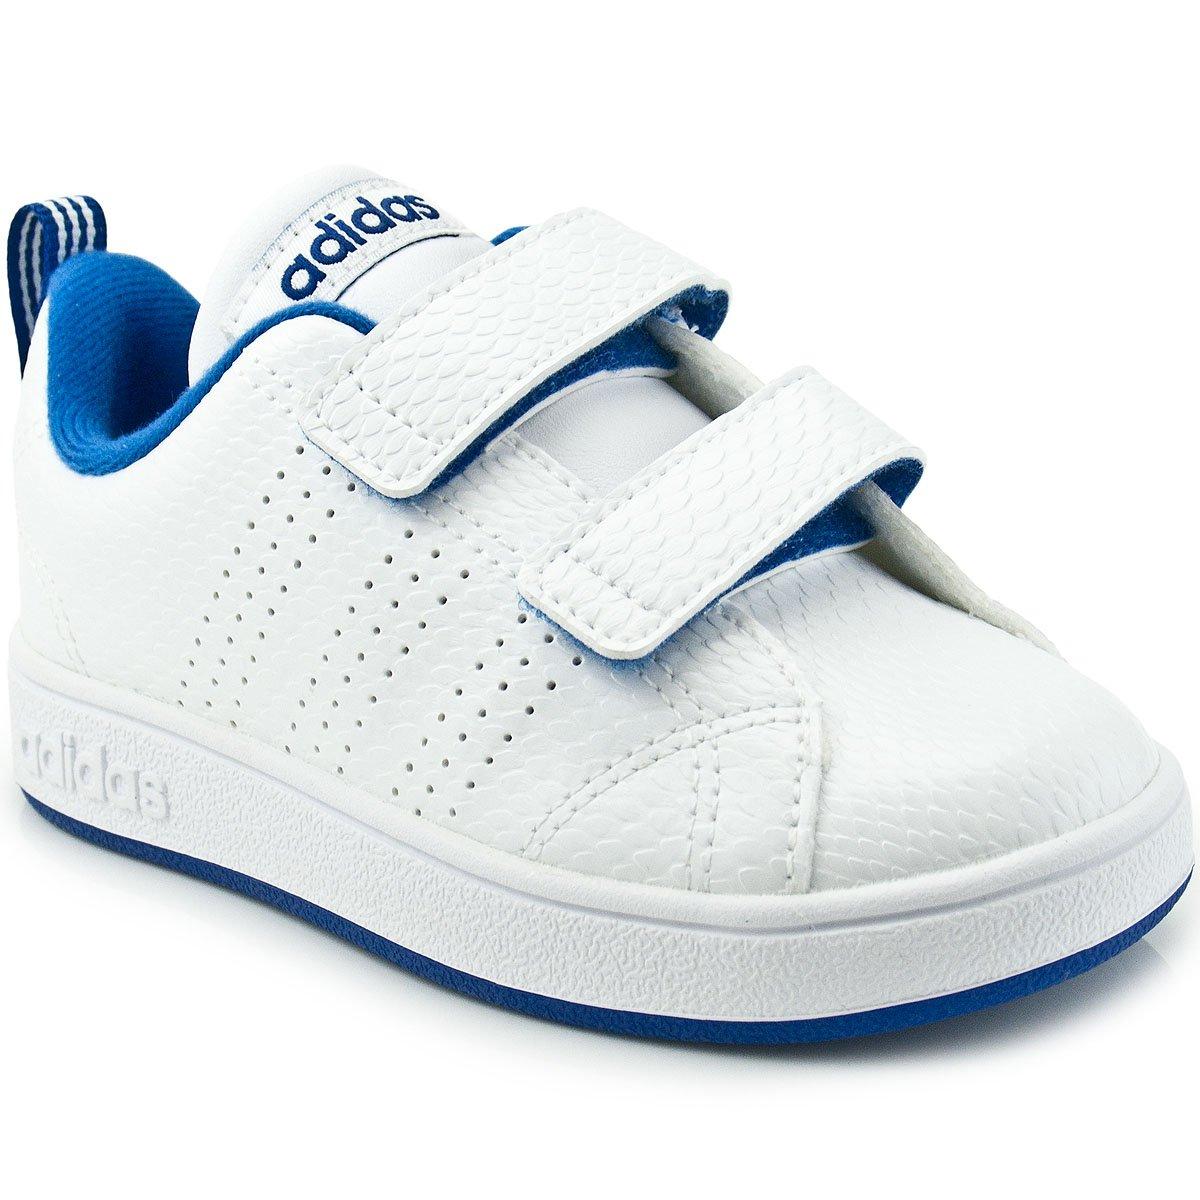 93e885783b4 Tênis Infantil Adidas Advantage VS Clean